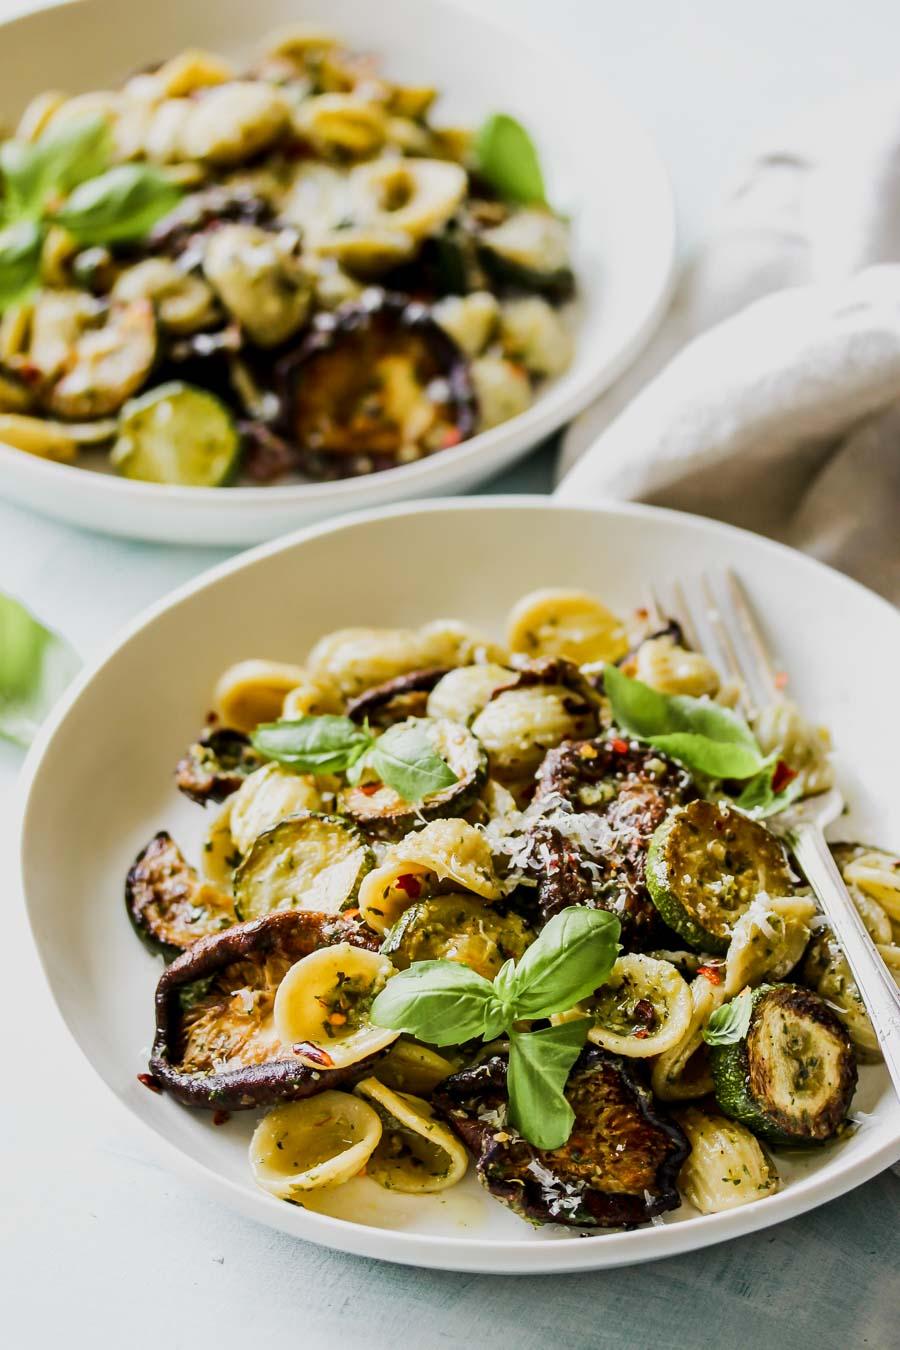 30 Minute Zucchini Pesto Pasta with Buttery Mushrooms